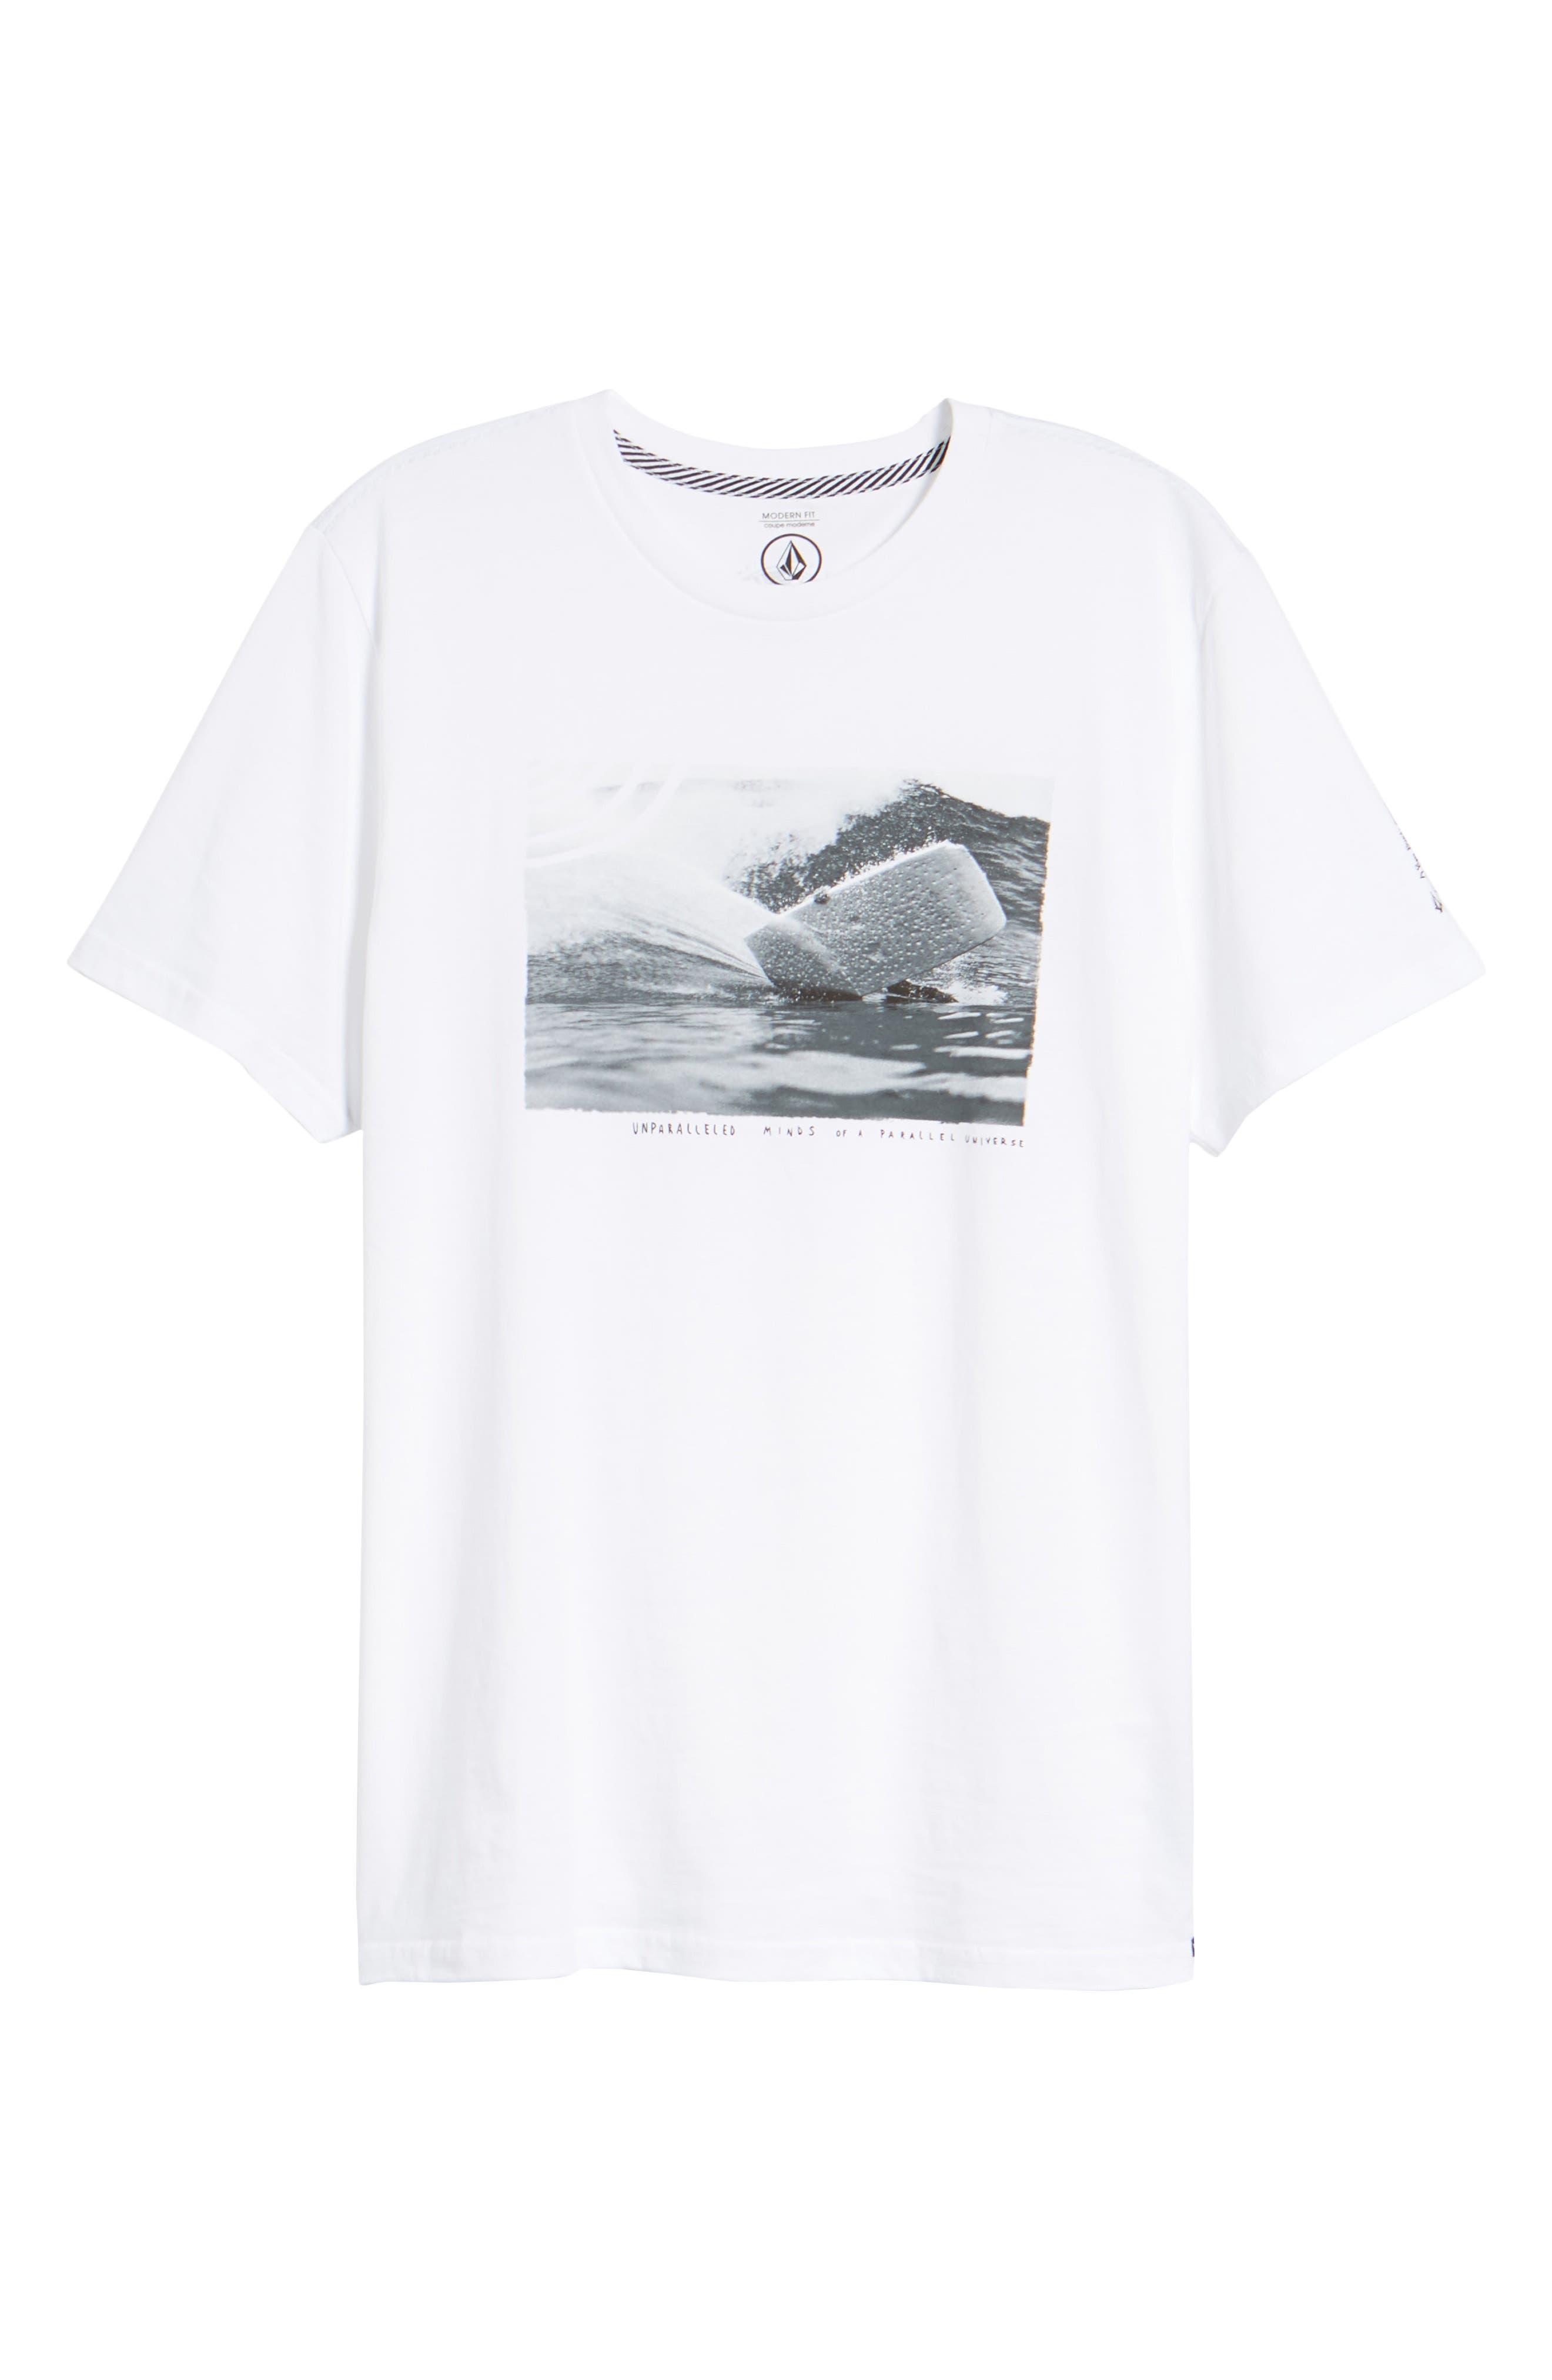 Burch Foam Graphic T-Shirt,                             Alternate thumbnail 6, color,                             White